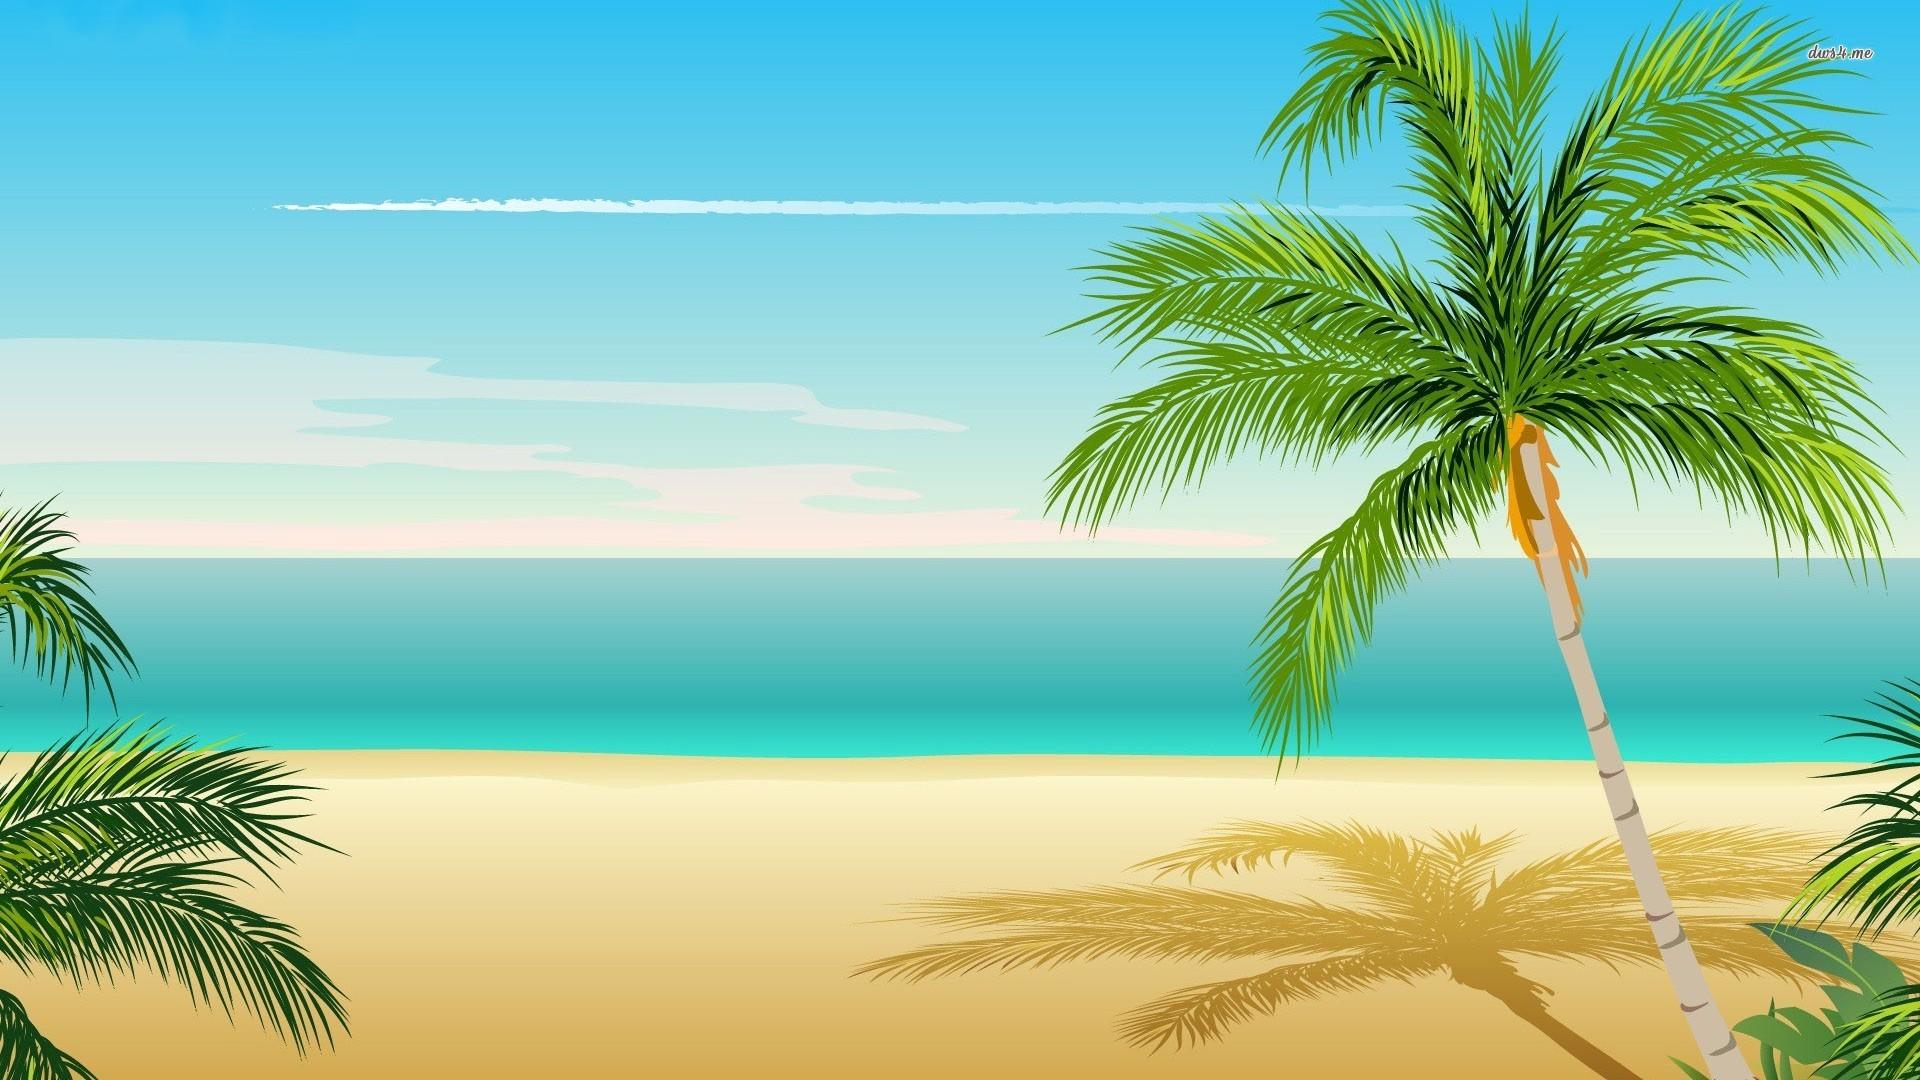 palm tree iphone wallpaper hd